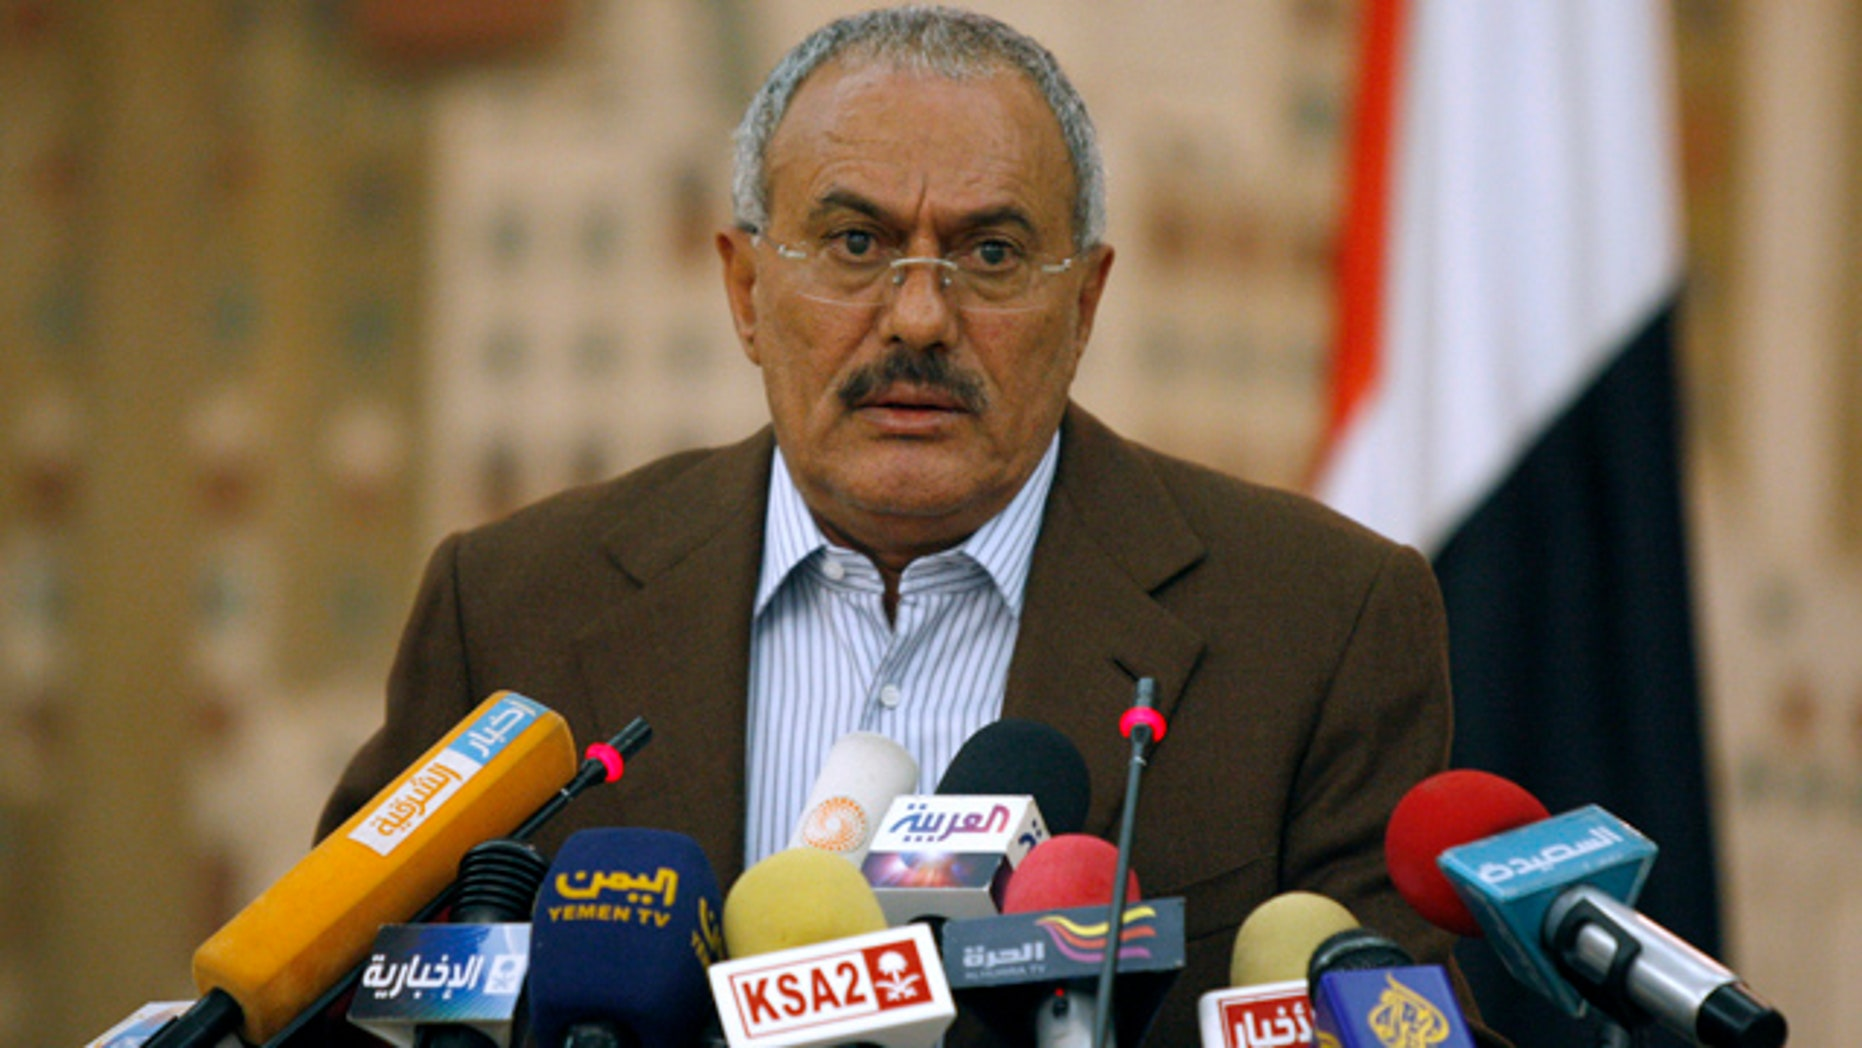 March 18: Yemeni President Ali Abdullah Saleh looks on during a media conference in Sanaa, Yemen.